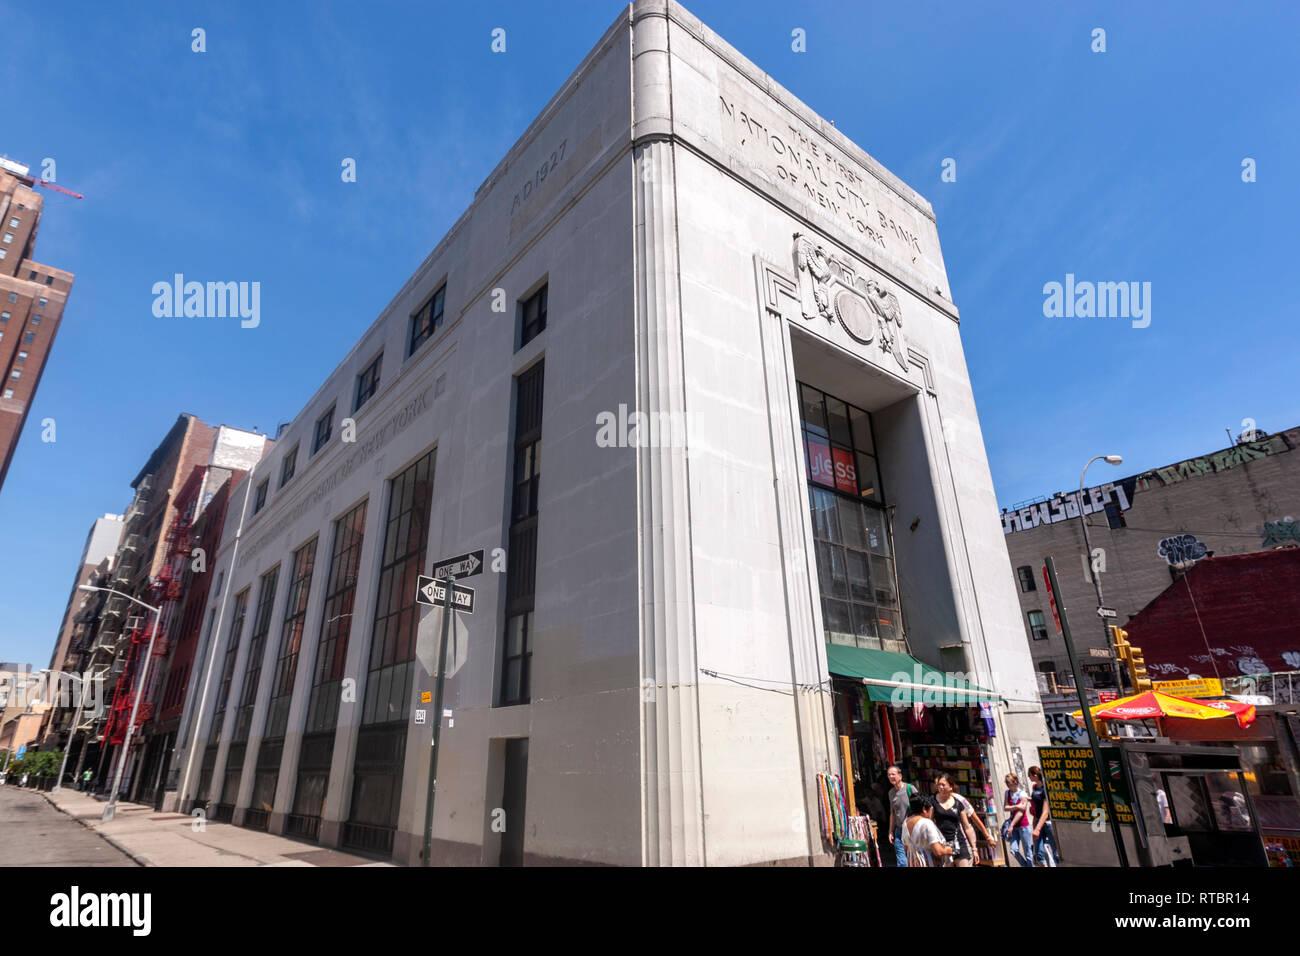 Art Modern First National City Bank of New York building, 415 Broadway, Manhattan, New York, USA - Stock Image